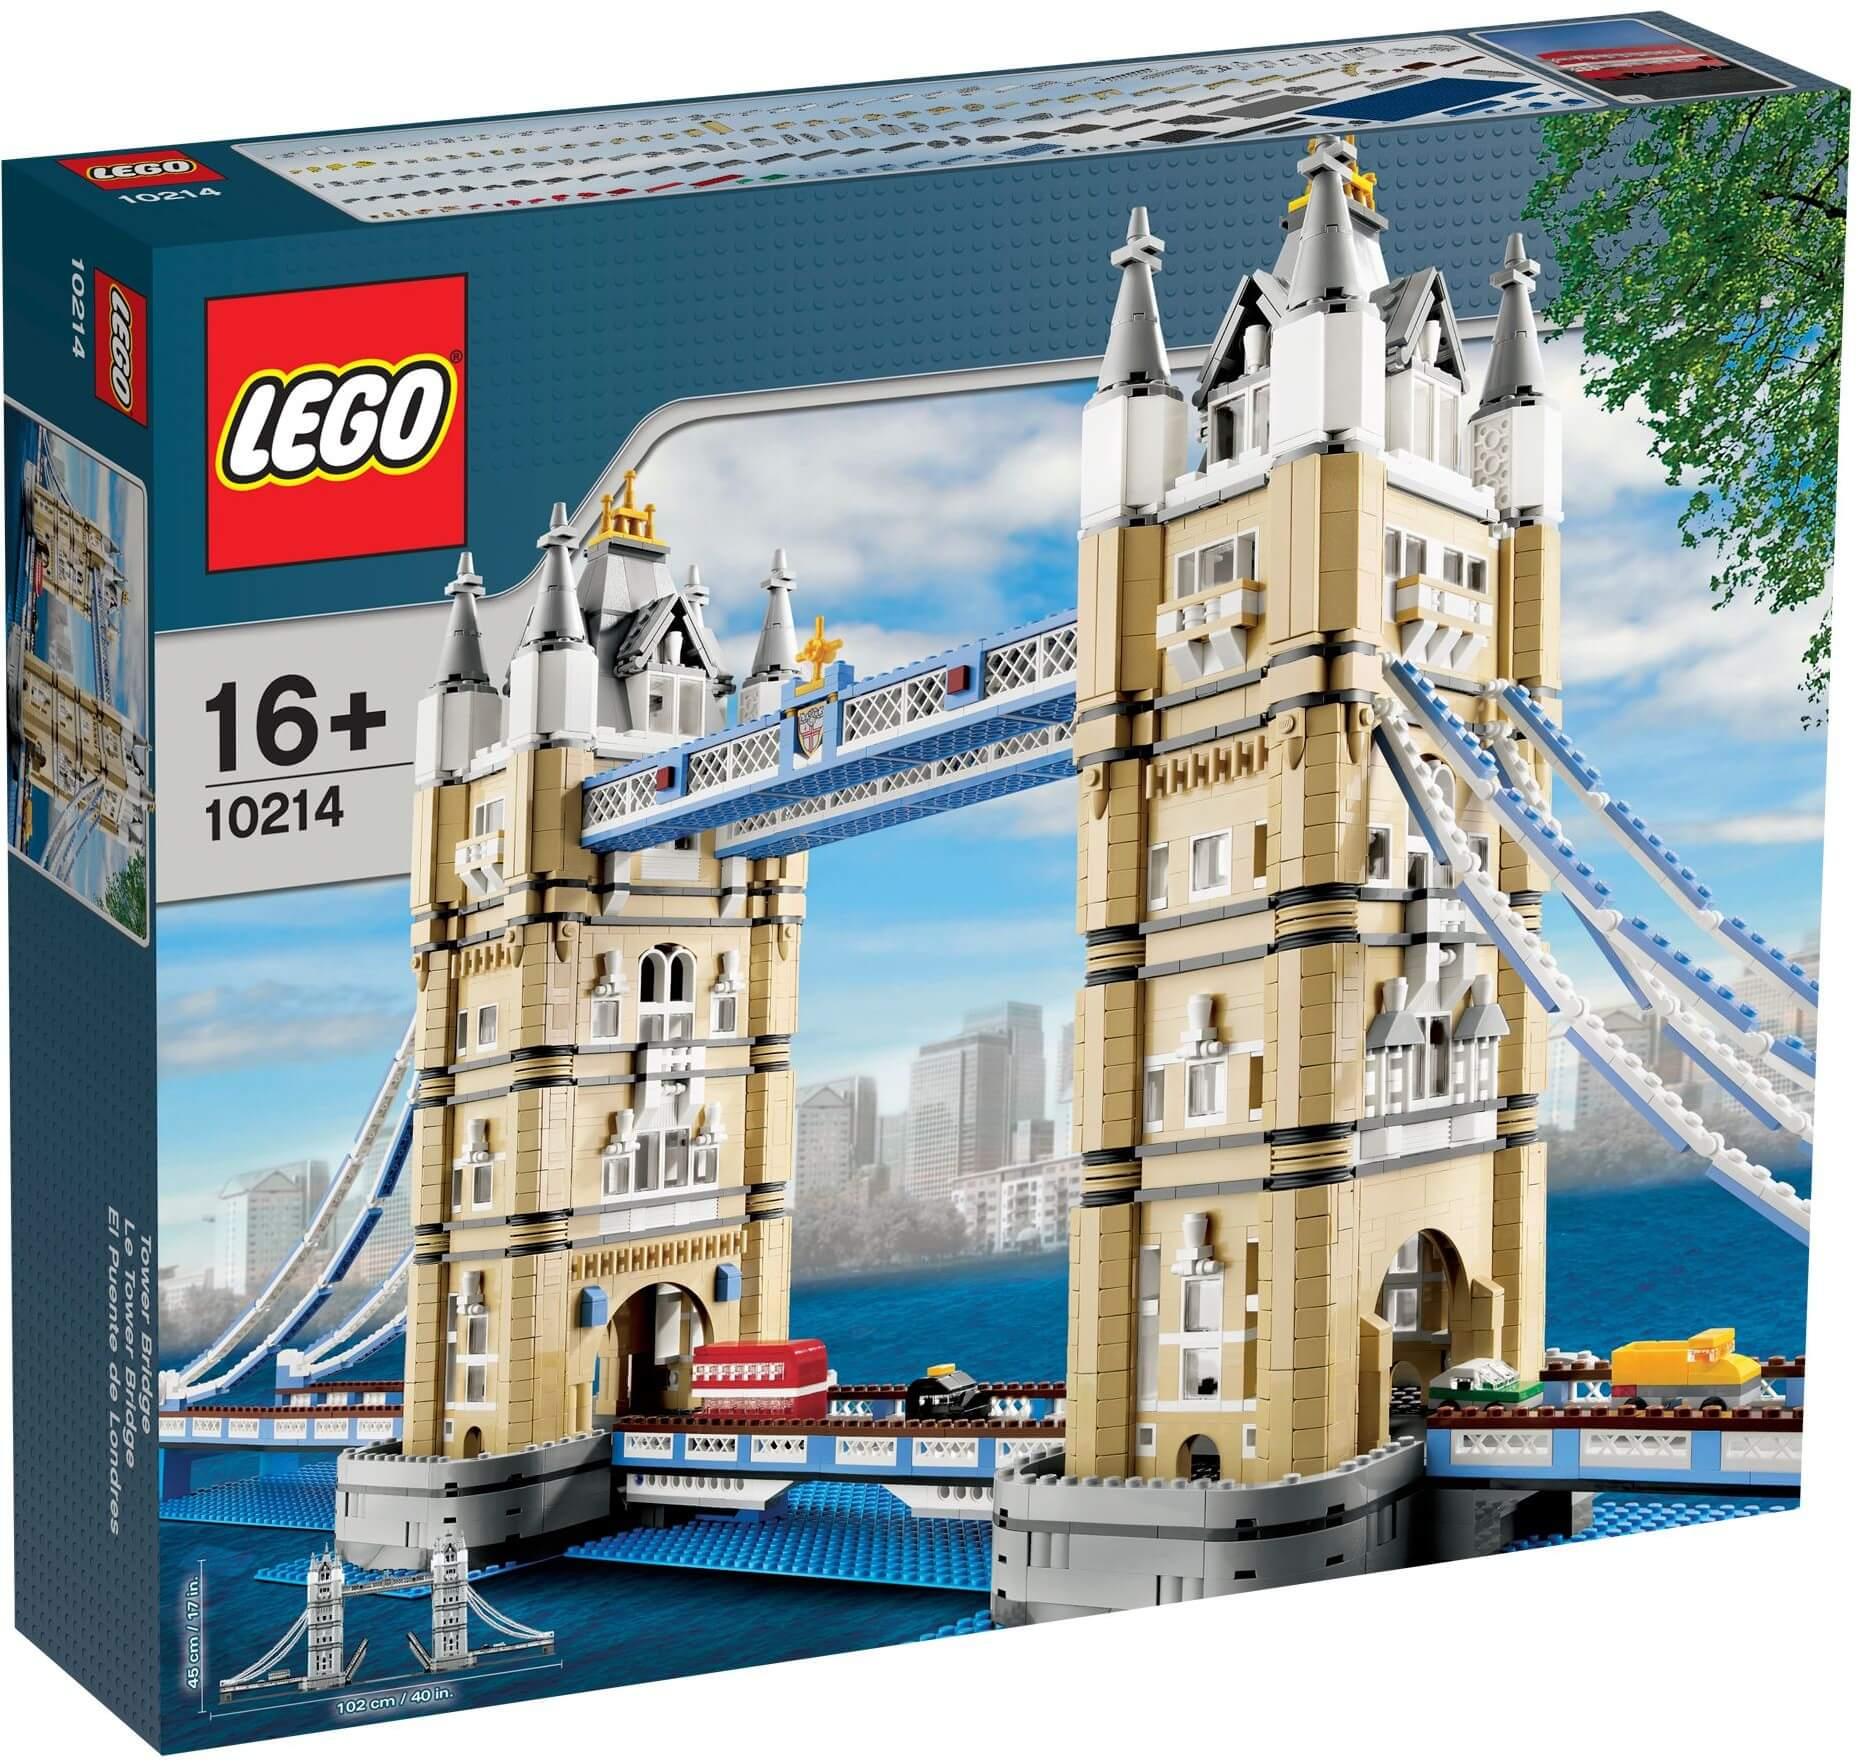 Mua đồ chơi LEGO 10214 - LEGO Creator Expert 10214 - Cầu Tháp Luân Đôn (LEGO Creator Expert London Tower Bridge 10214)